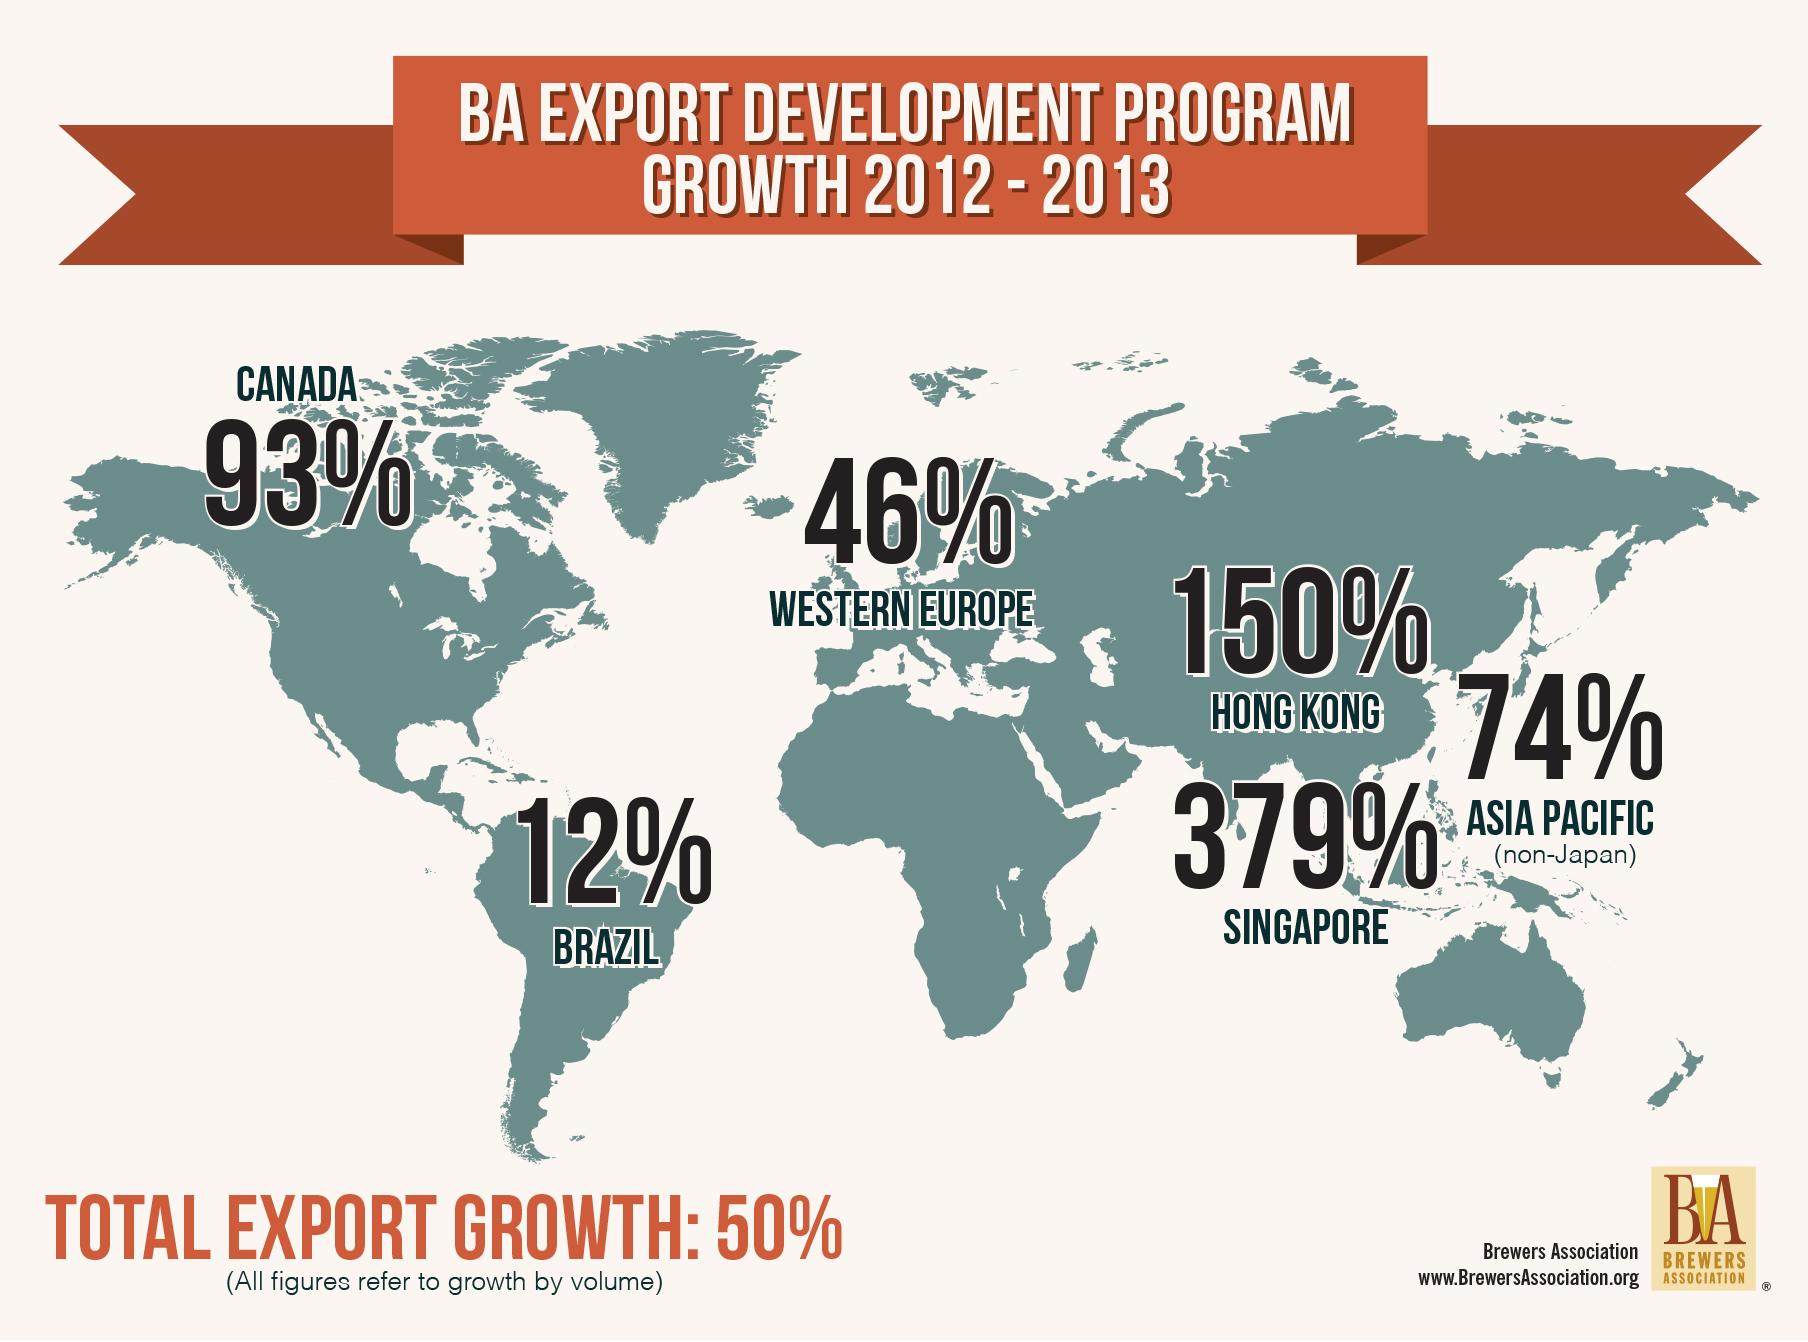 edp-growth.jpg